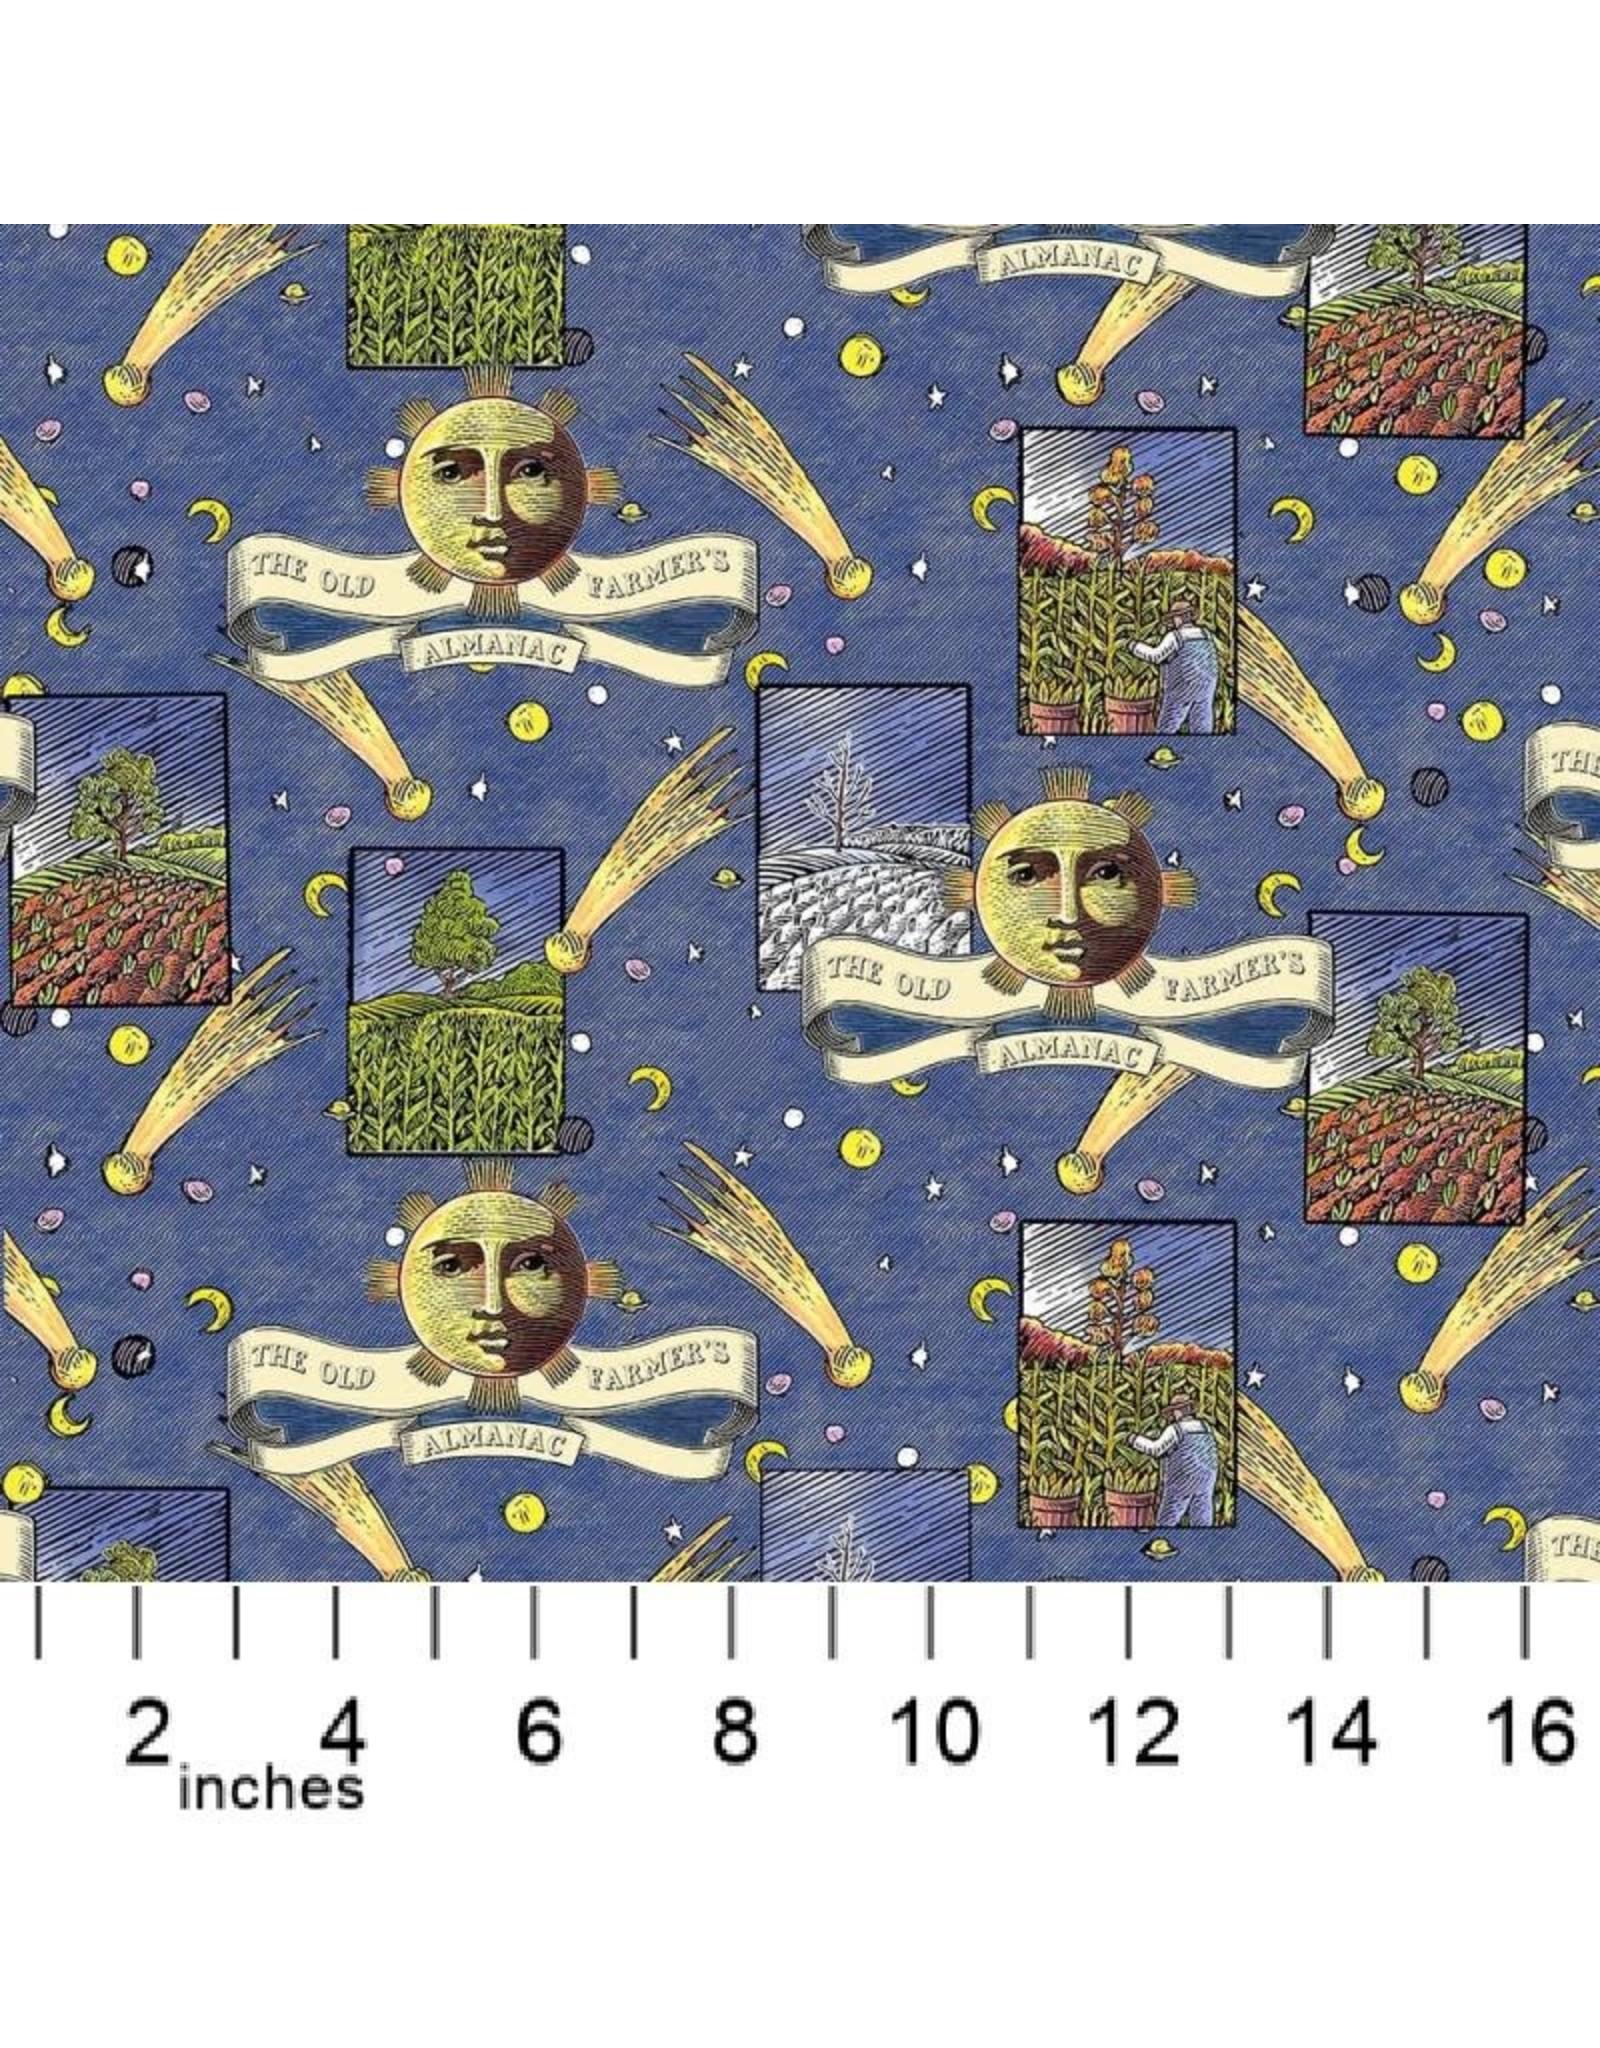 PD's Sykel Fabrics Collection Old Farmers Almanac, Celestial Patch, Dinner Napkin